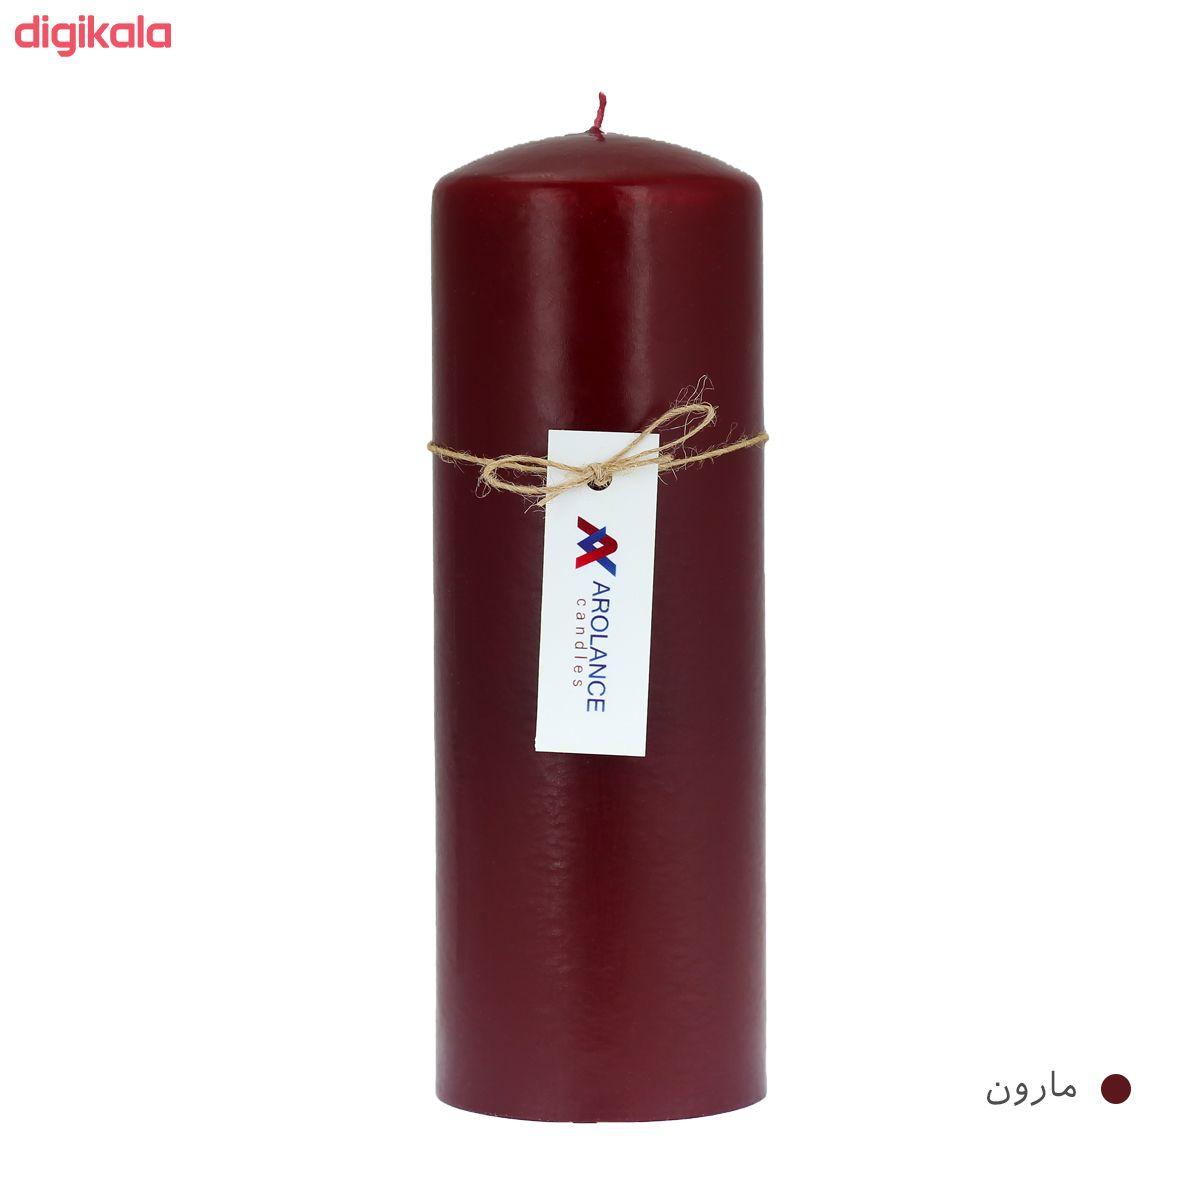 شمع آرولنس طرح استوانه مدل D720 main 1 1